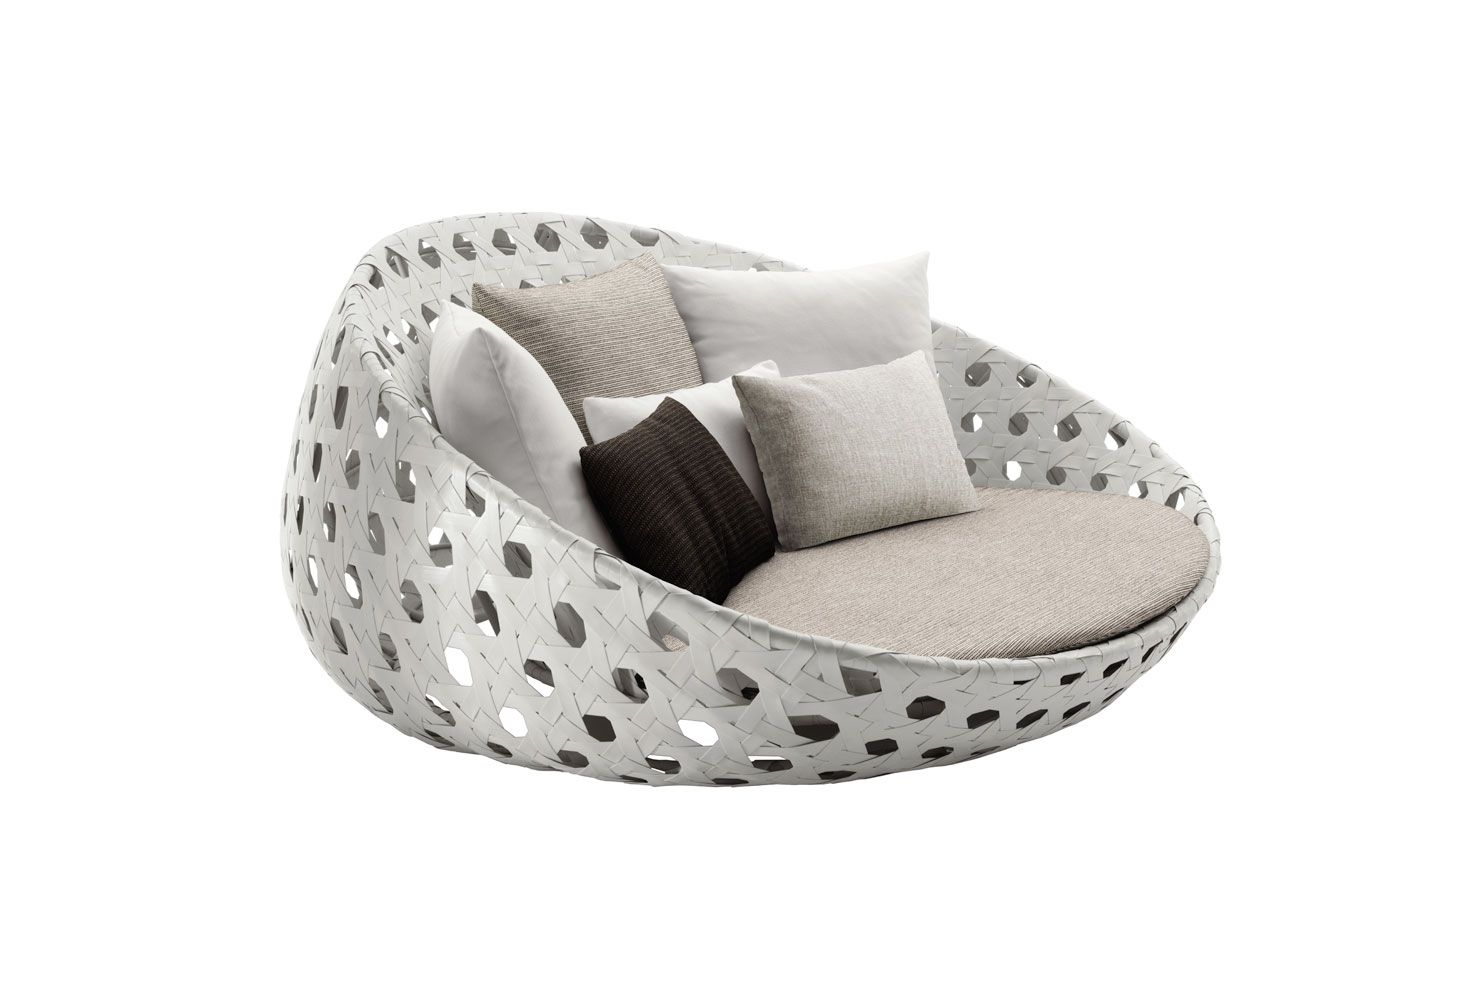 Sofa canasta collection b b italia outdoor design - Ausgefallene gartenmobel ...